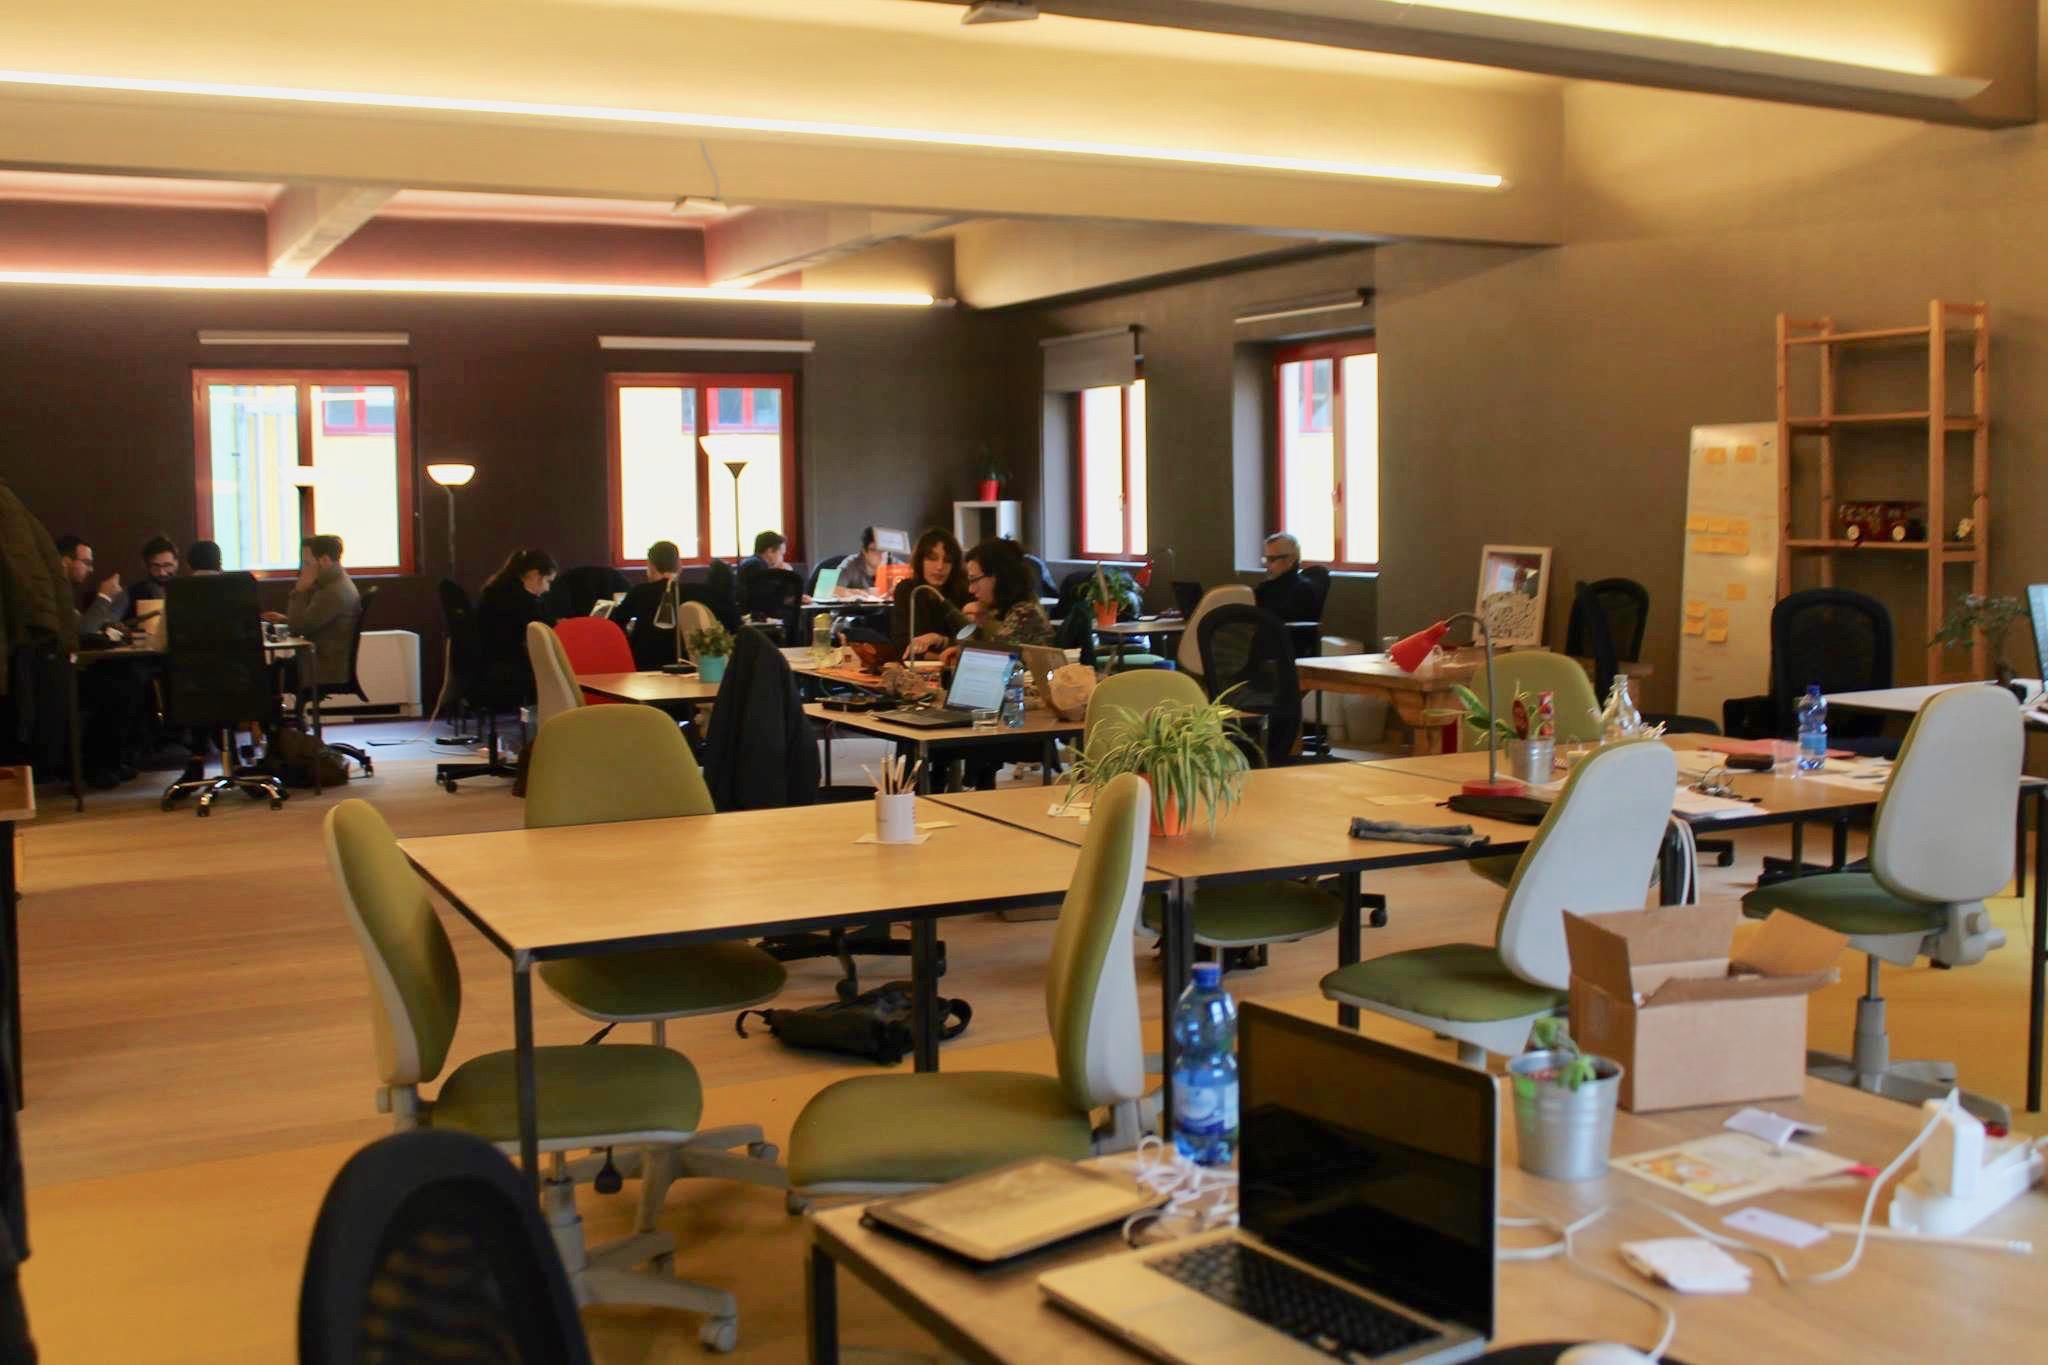 impact hub milano, spazi di coworking a milano, coworking milano